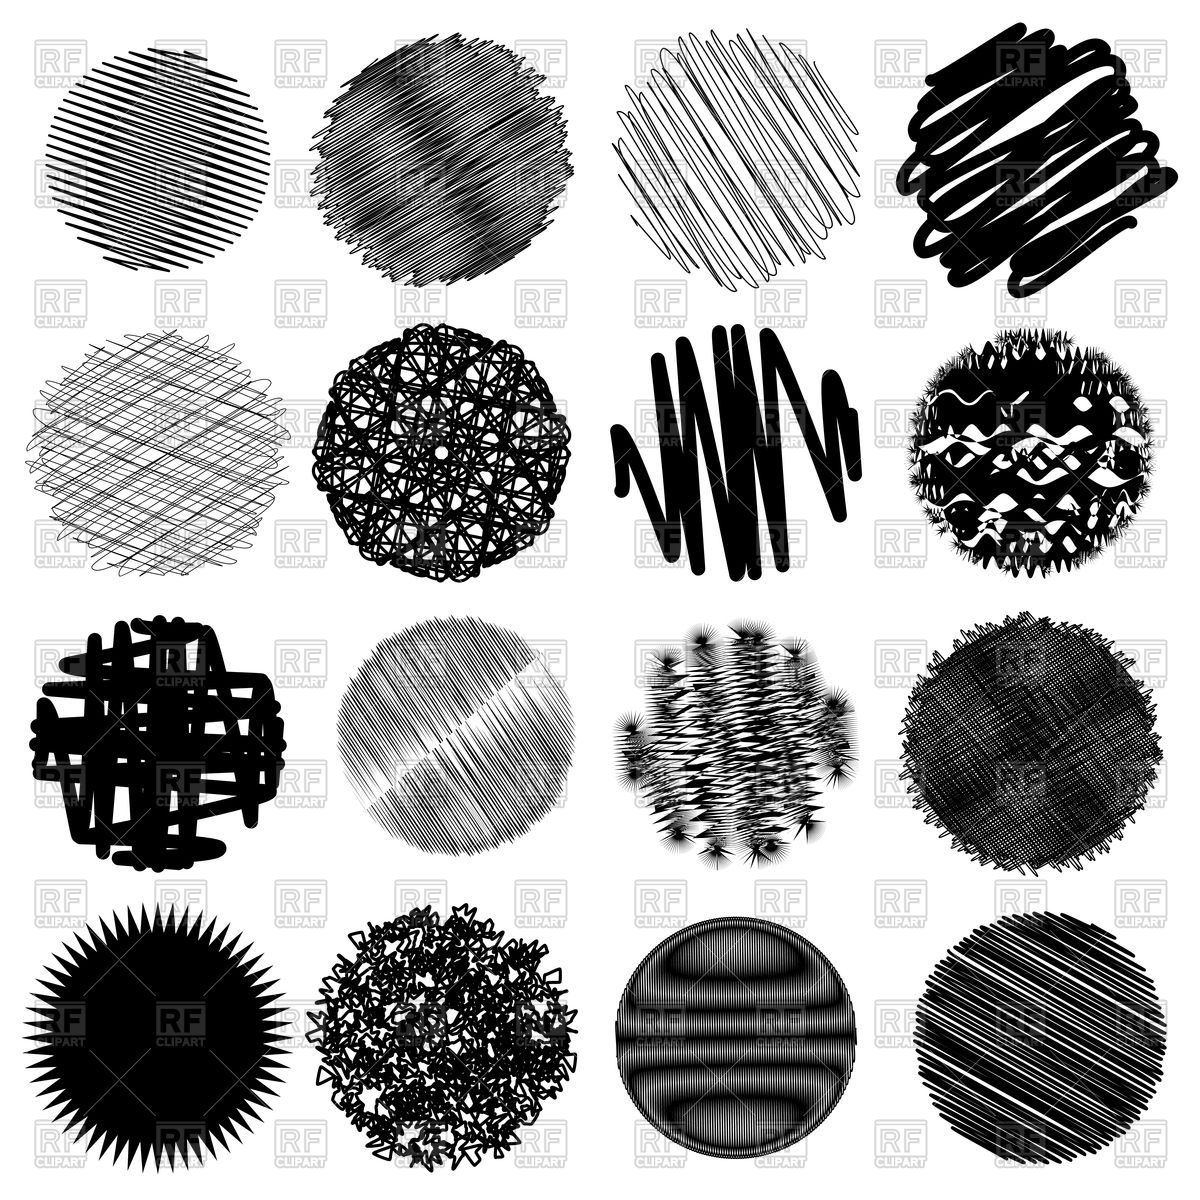 1200x1200 Hand Drawn Sketch Circles With Shading Fill Vector Image Vector